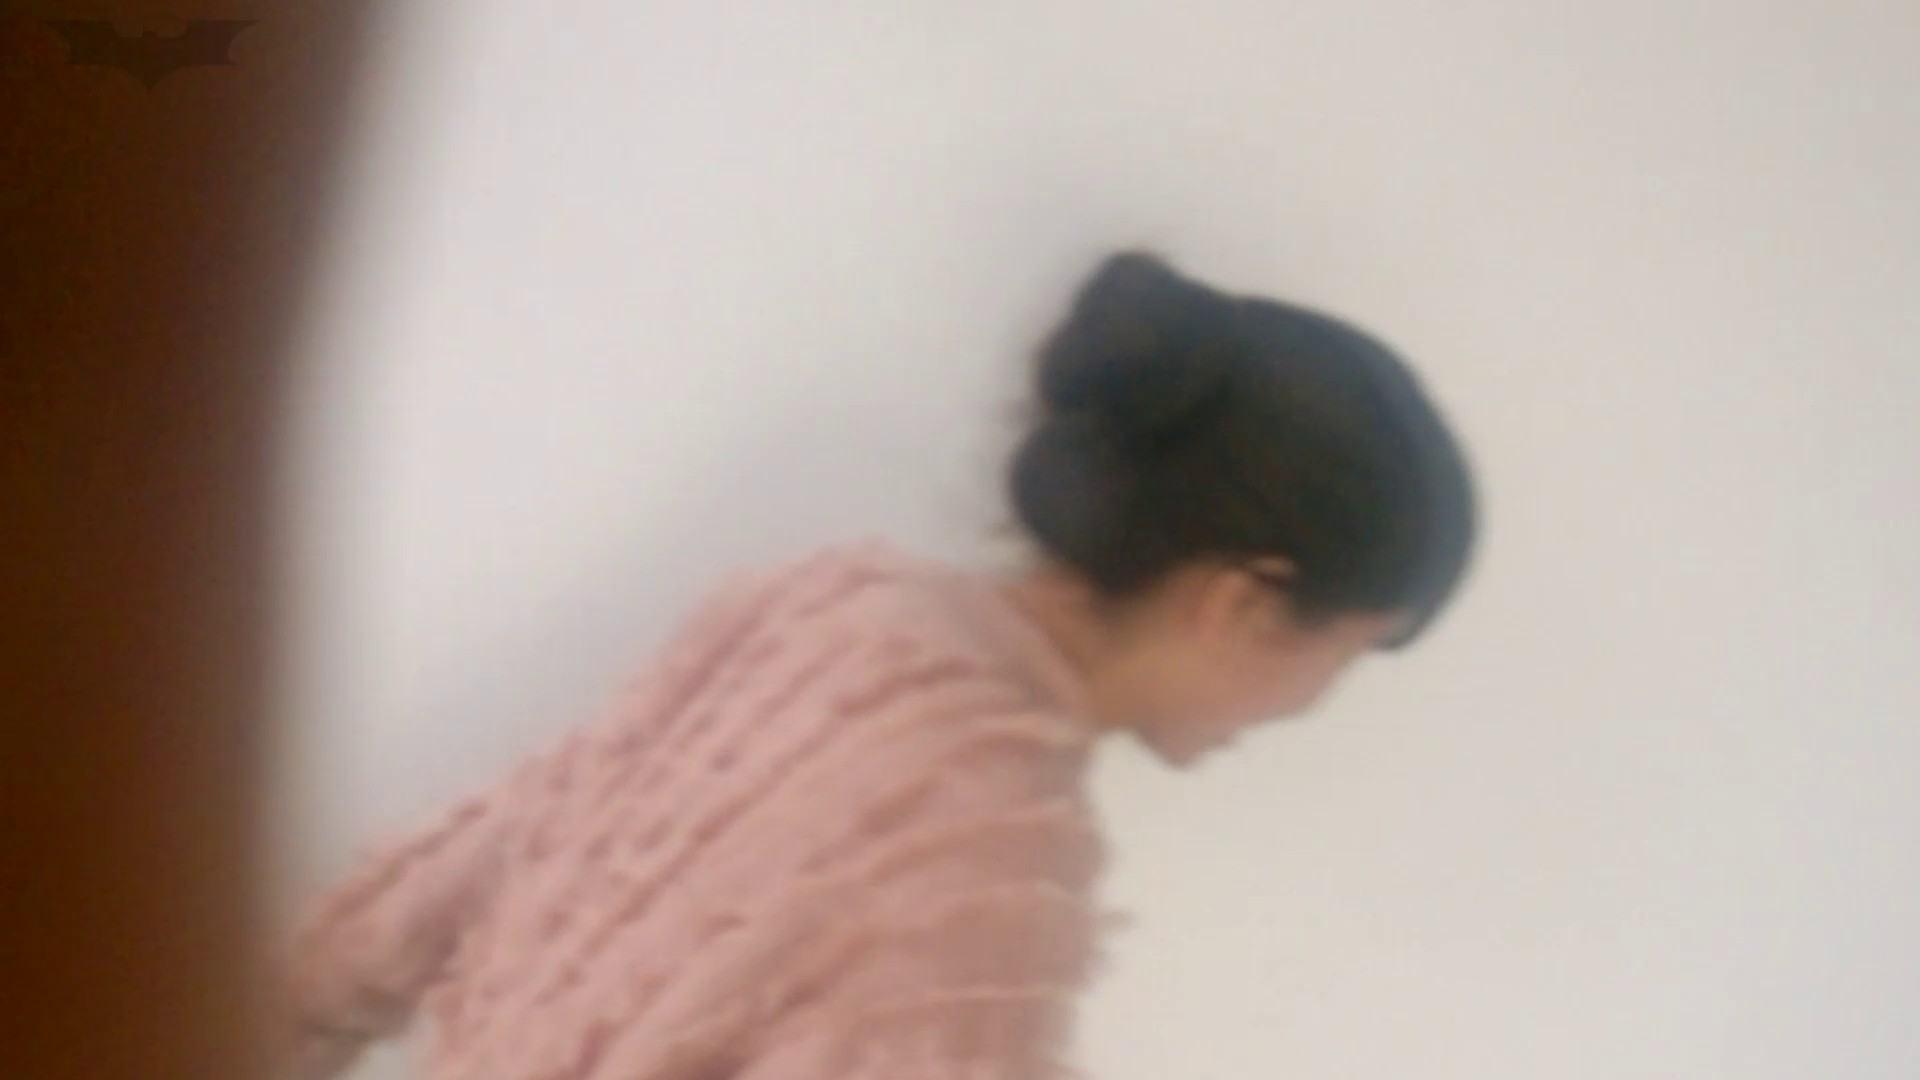 JD盗撮 美女の洗面所の秘密 Vol.06 細身女性 AV動画キャプチャ 79画像 60